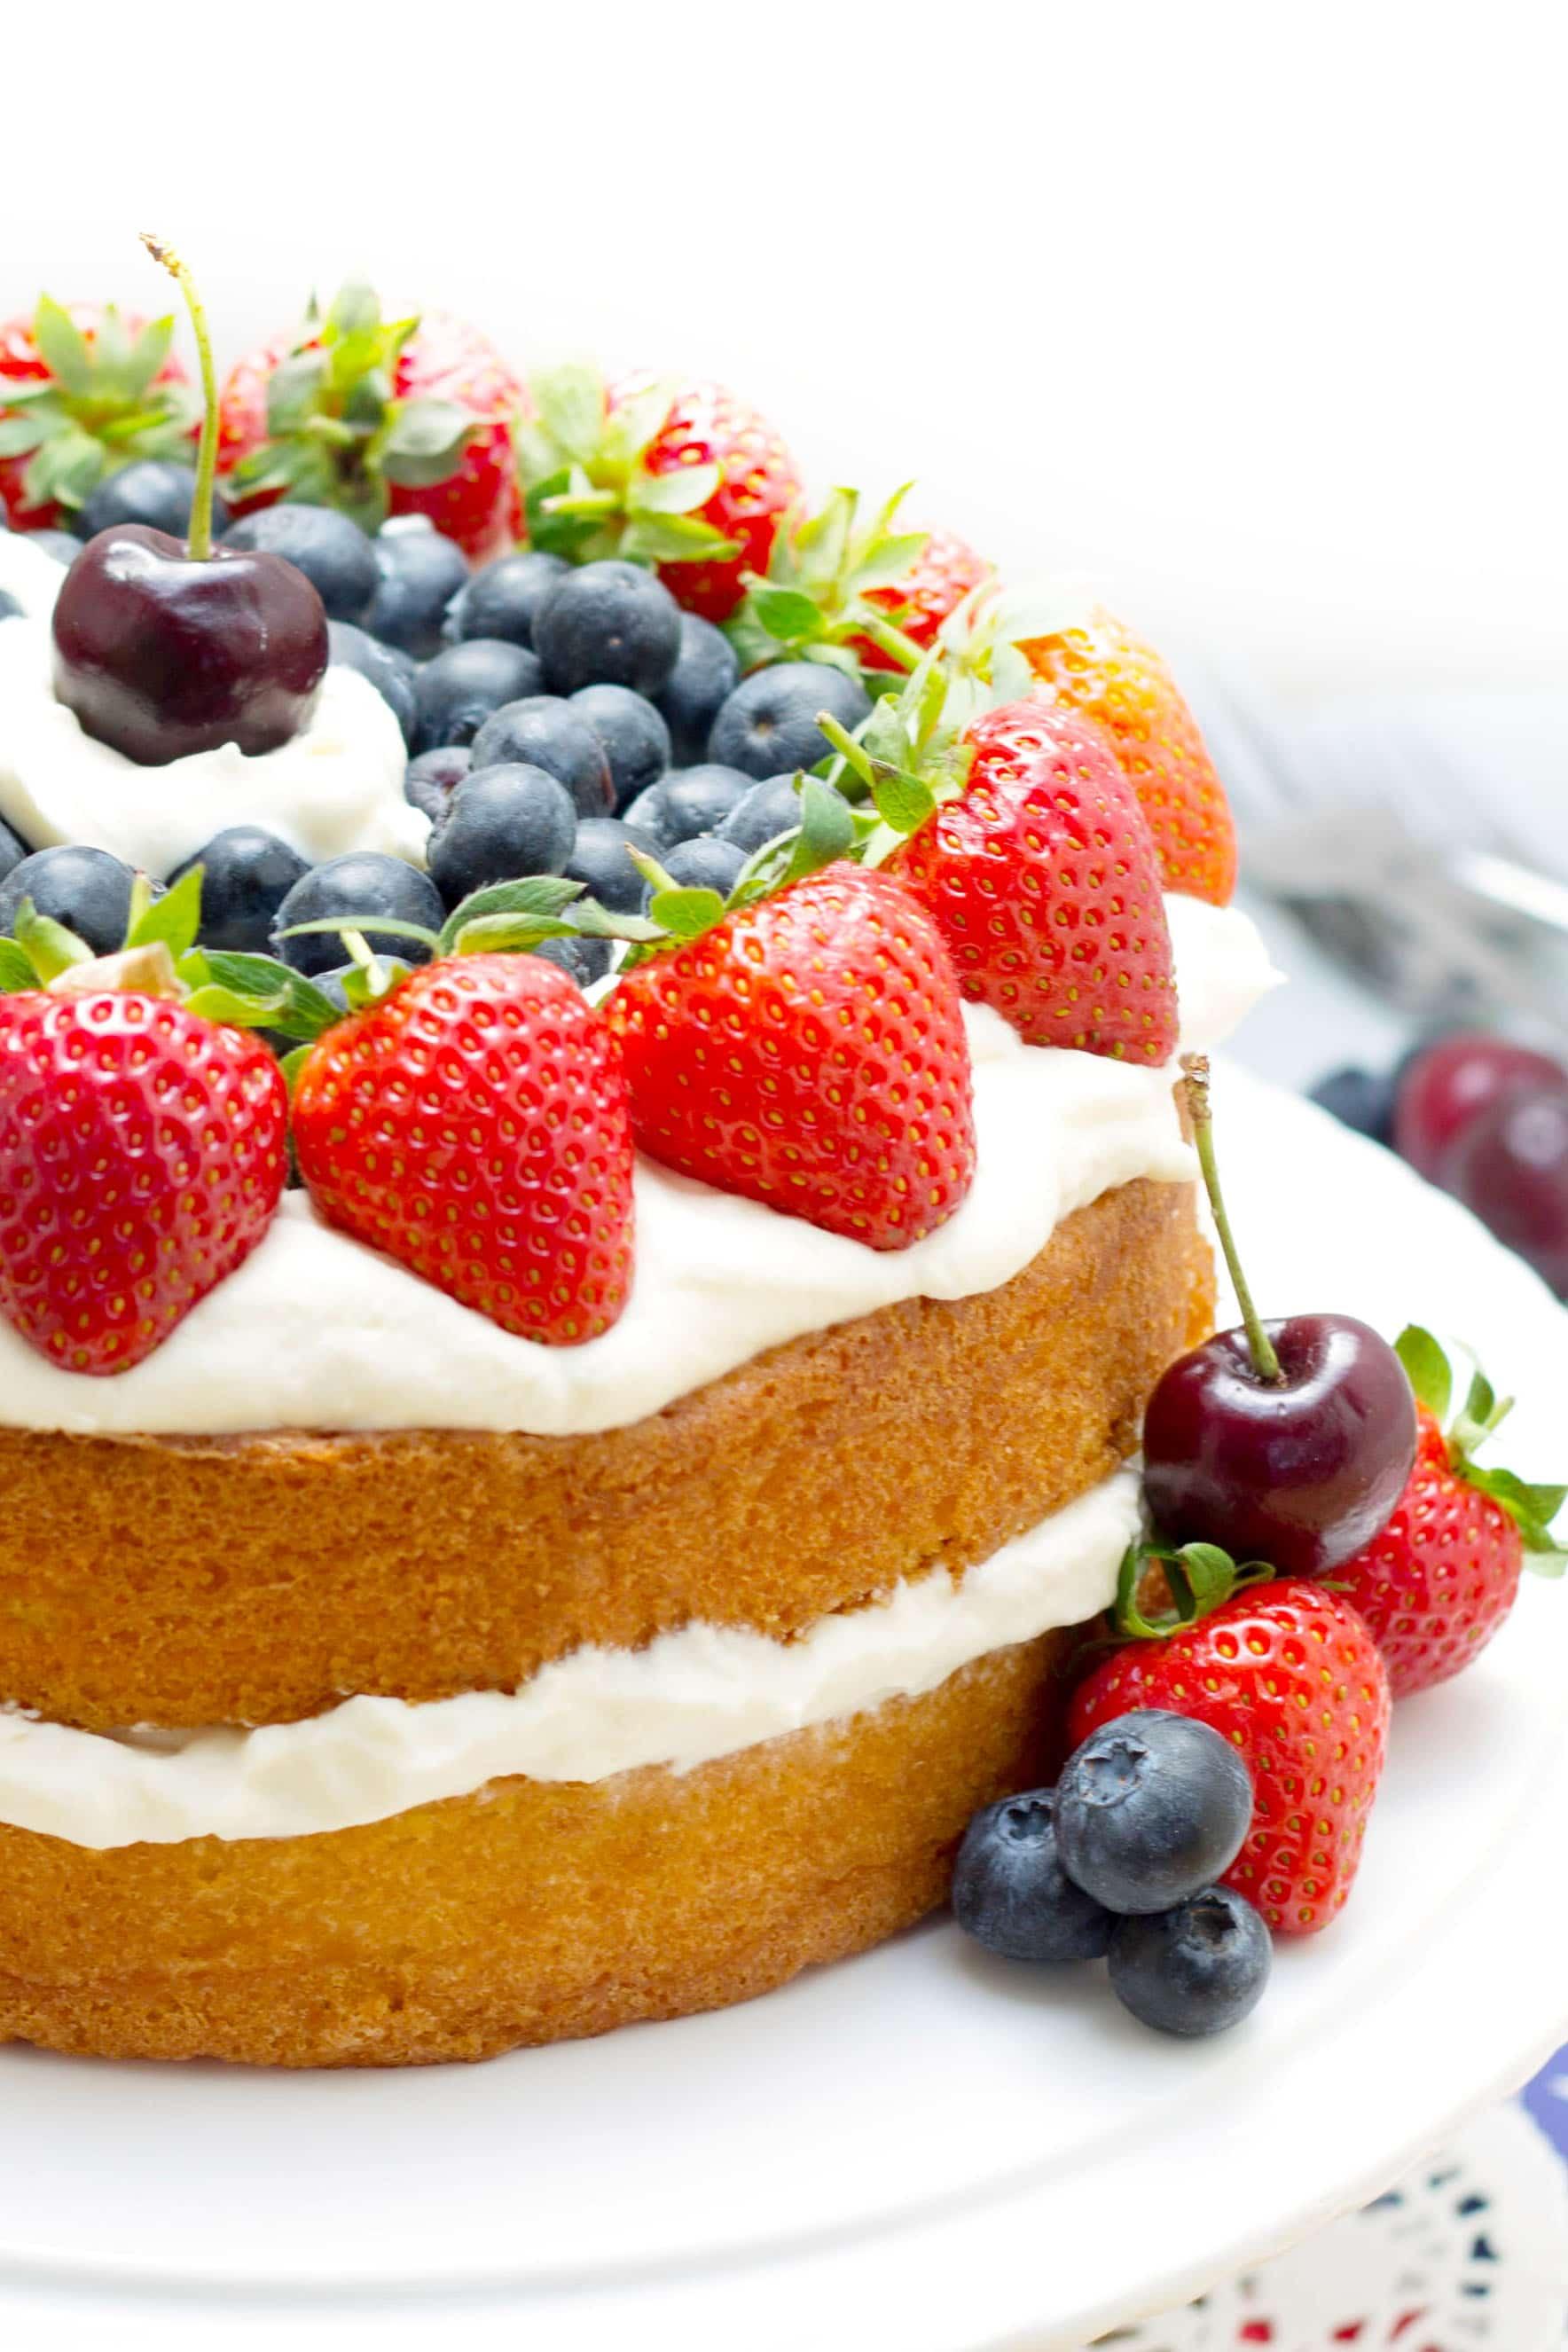 Patriotic Vanilla Cream Sponge Cake - Erren's Kitchen